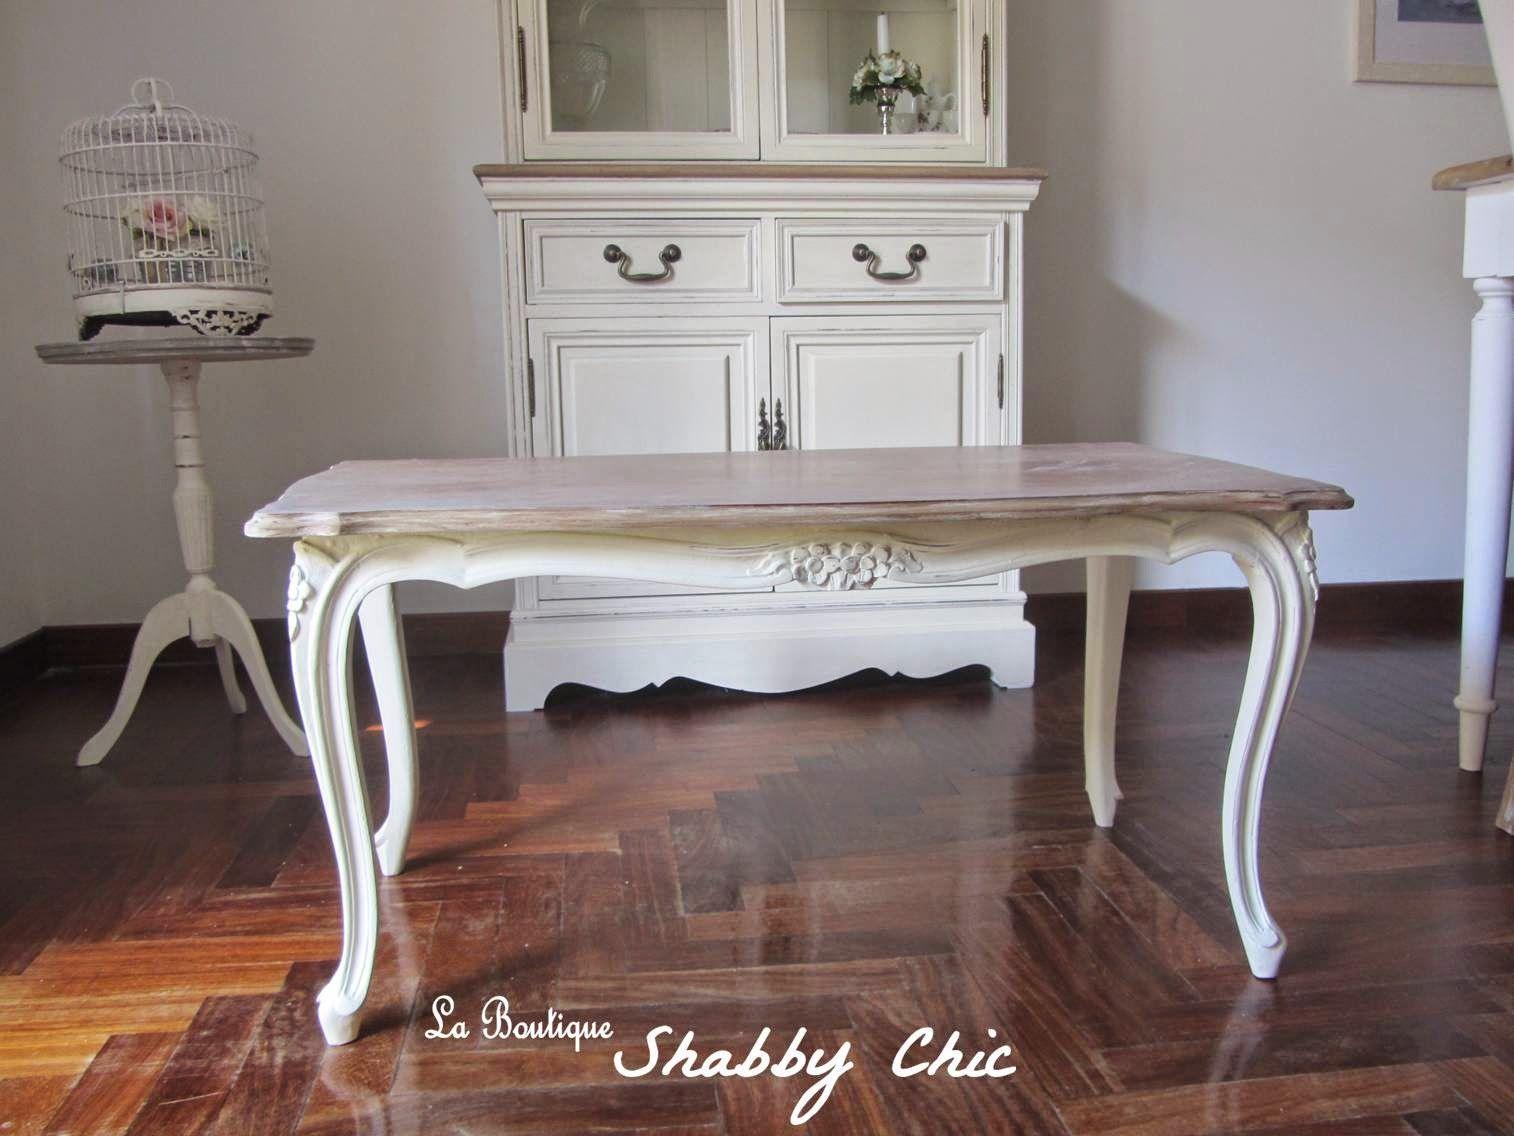 Tavolino Shabby Chic | La Boutique Shabby Chic | Restore ...